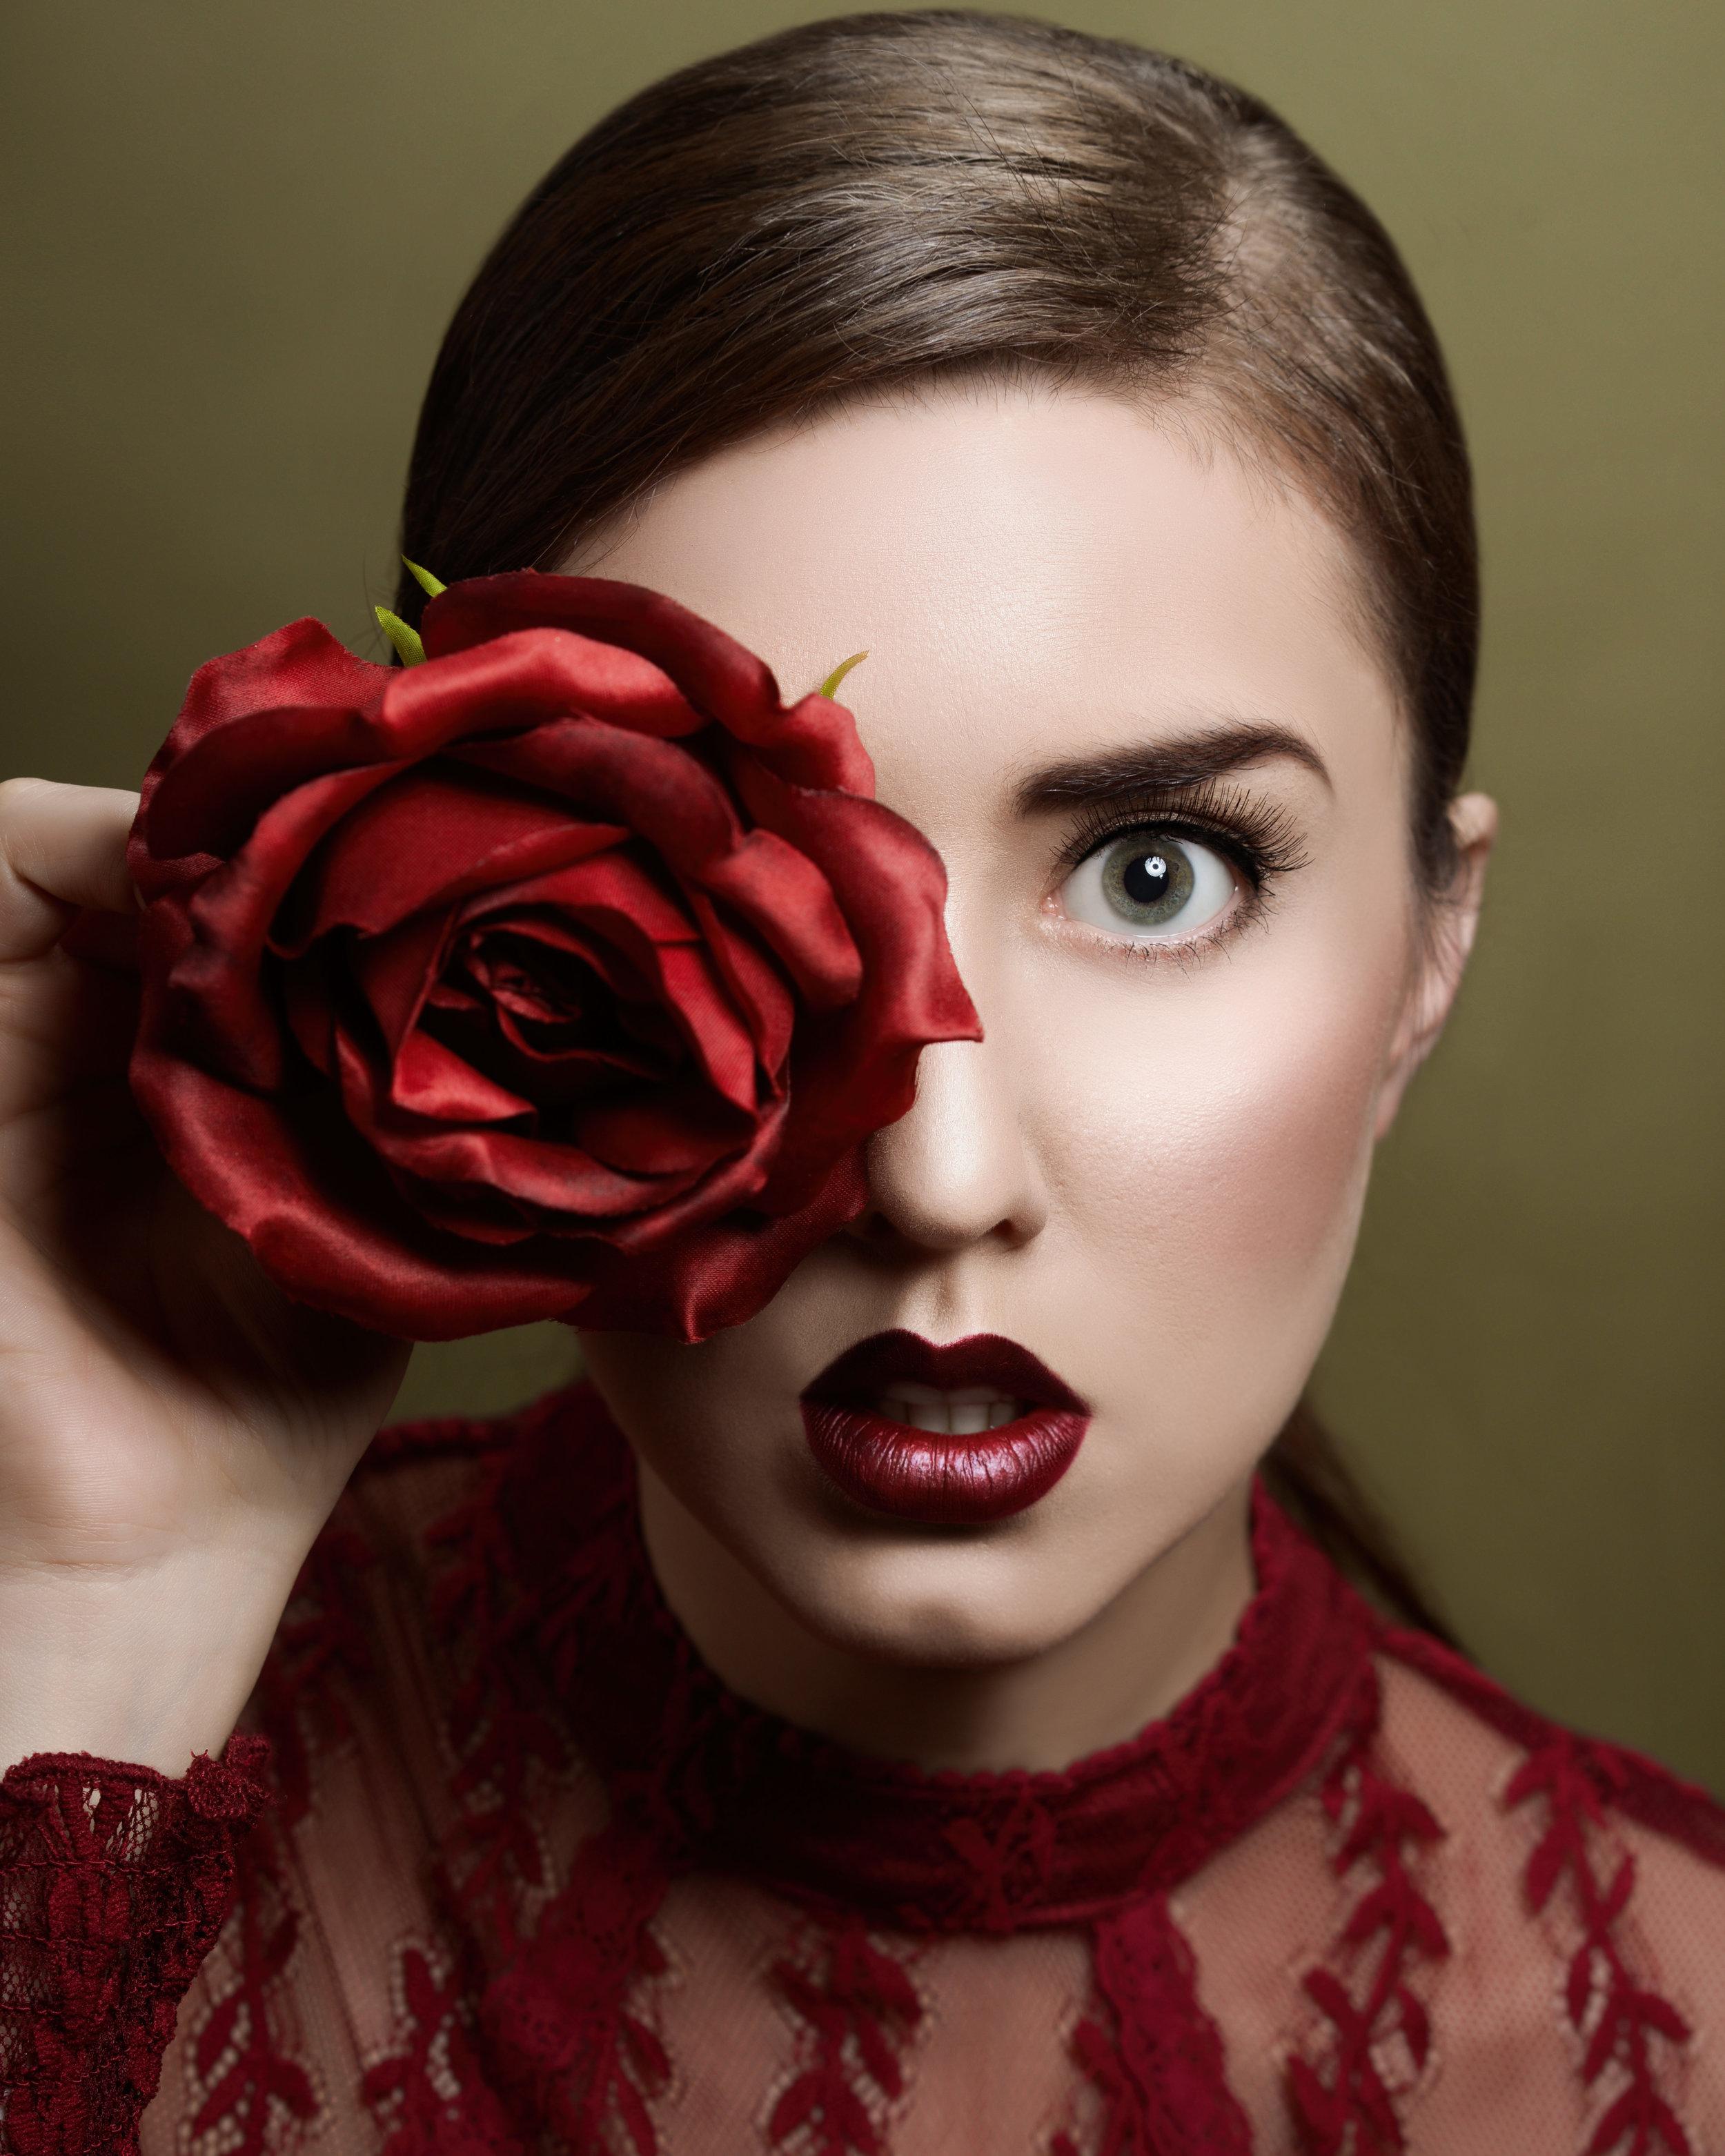 Anthem in Art Houston Texas Beauty Model Photography 2